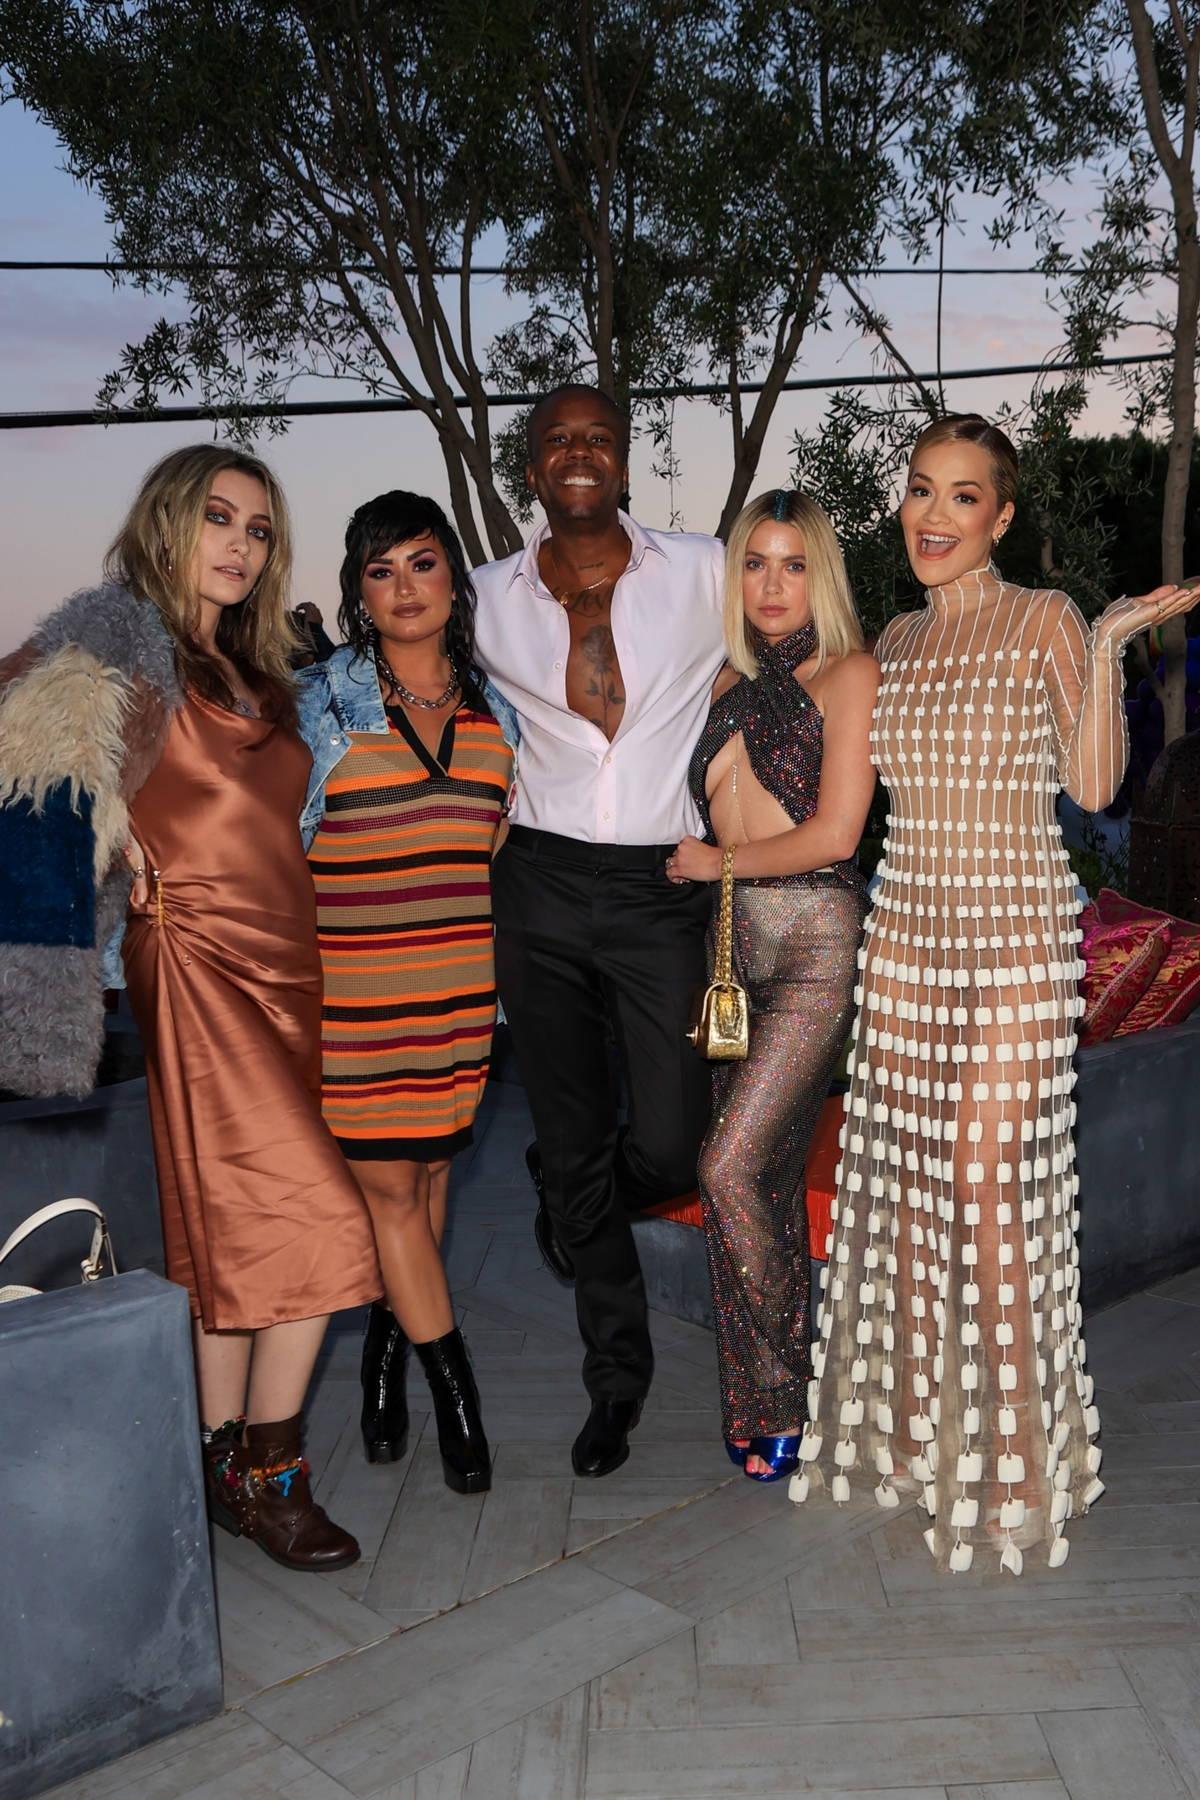 Rita, Ora, Demi Lovato, Paris Jackson and Ashley Benson attend Vas J Morgan's PRIDE 2021 party In Los Angeles, California